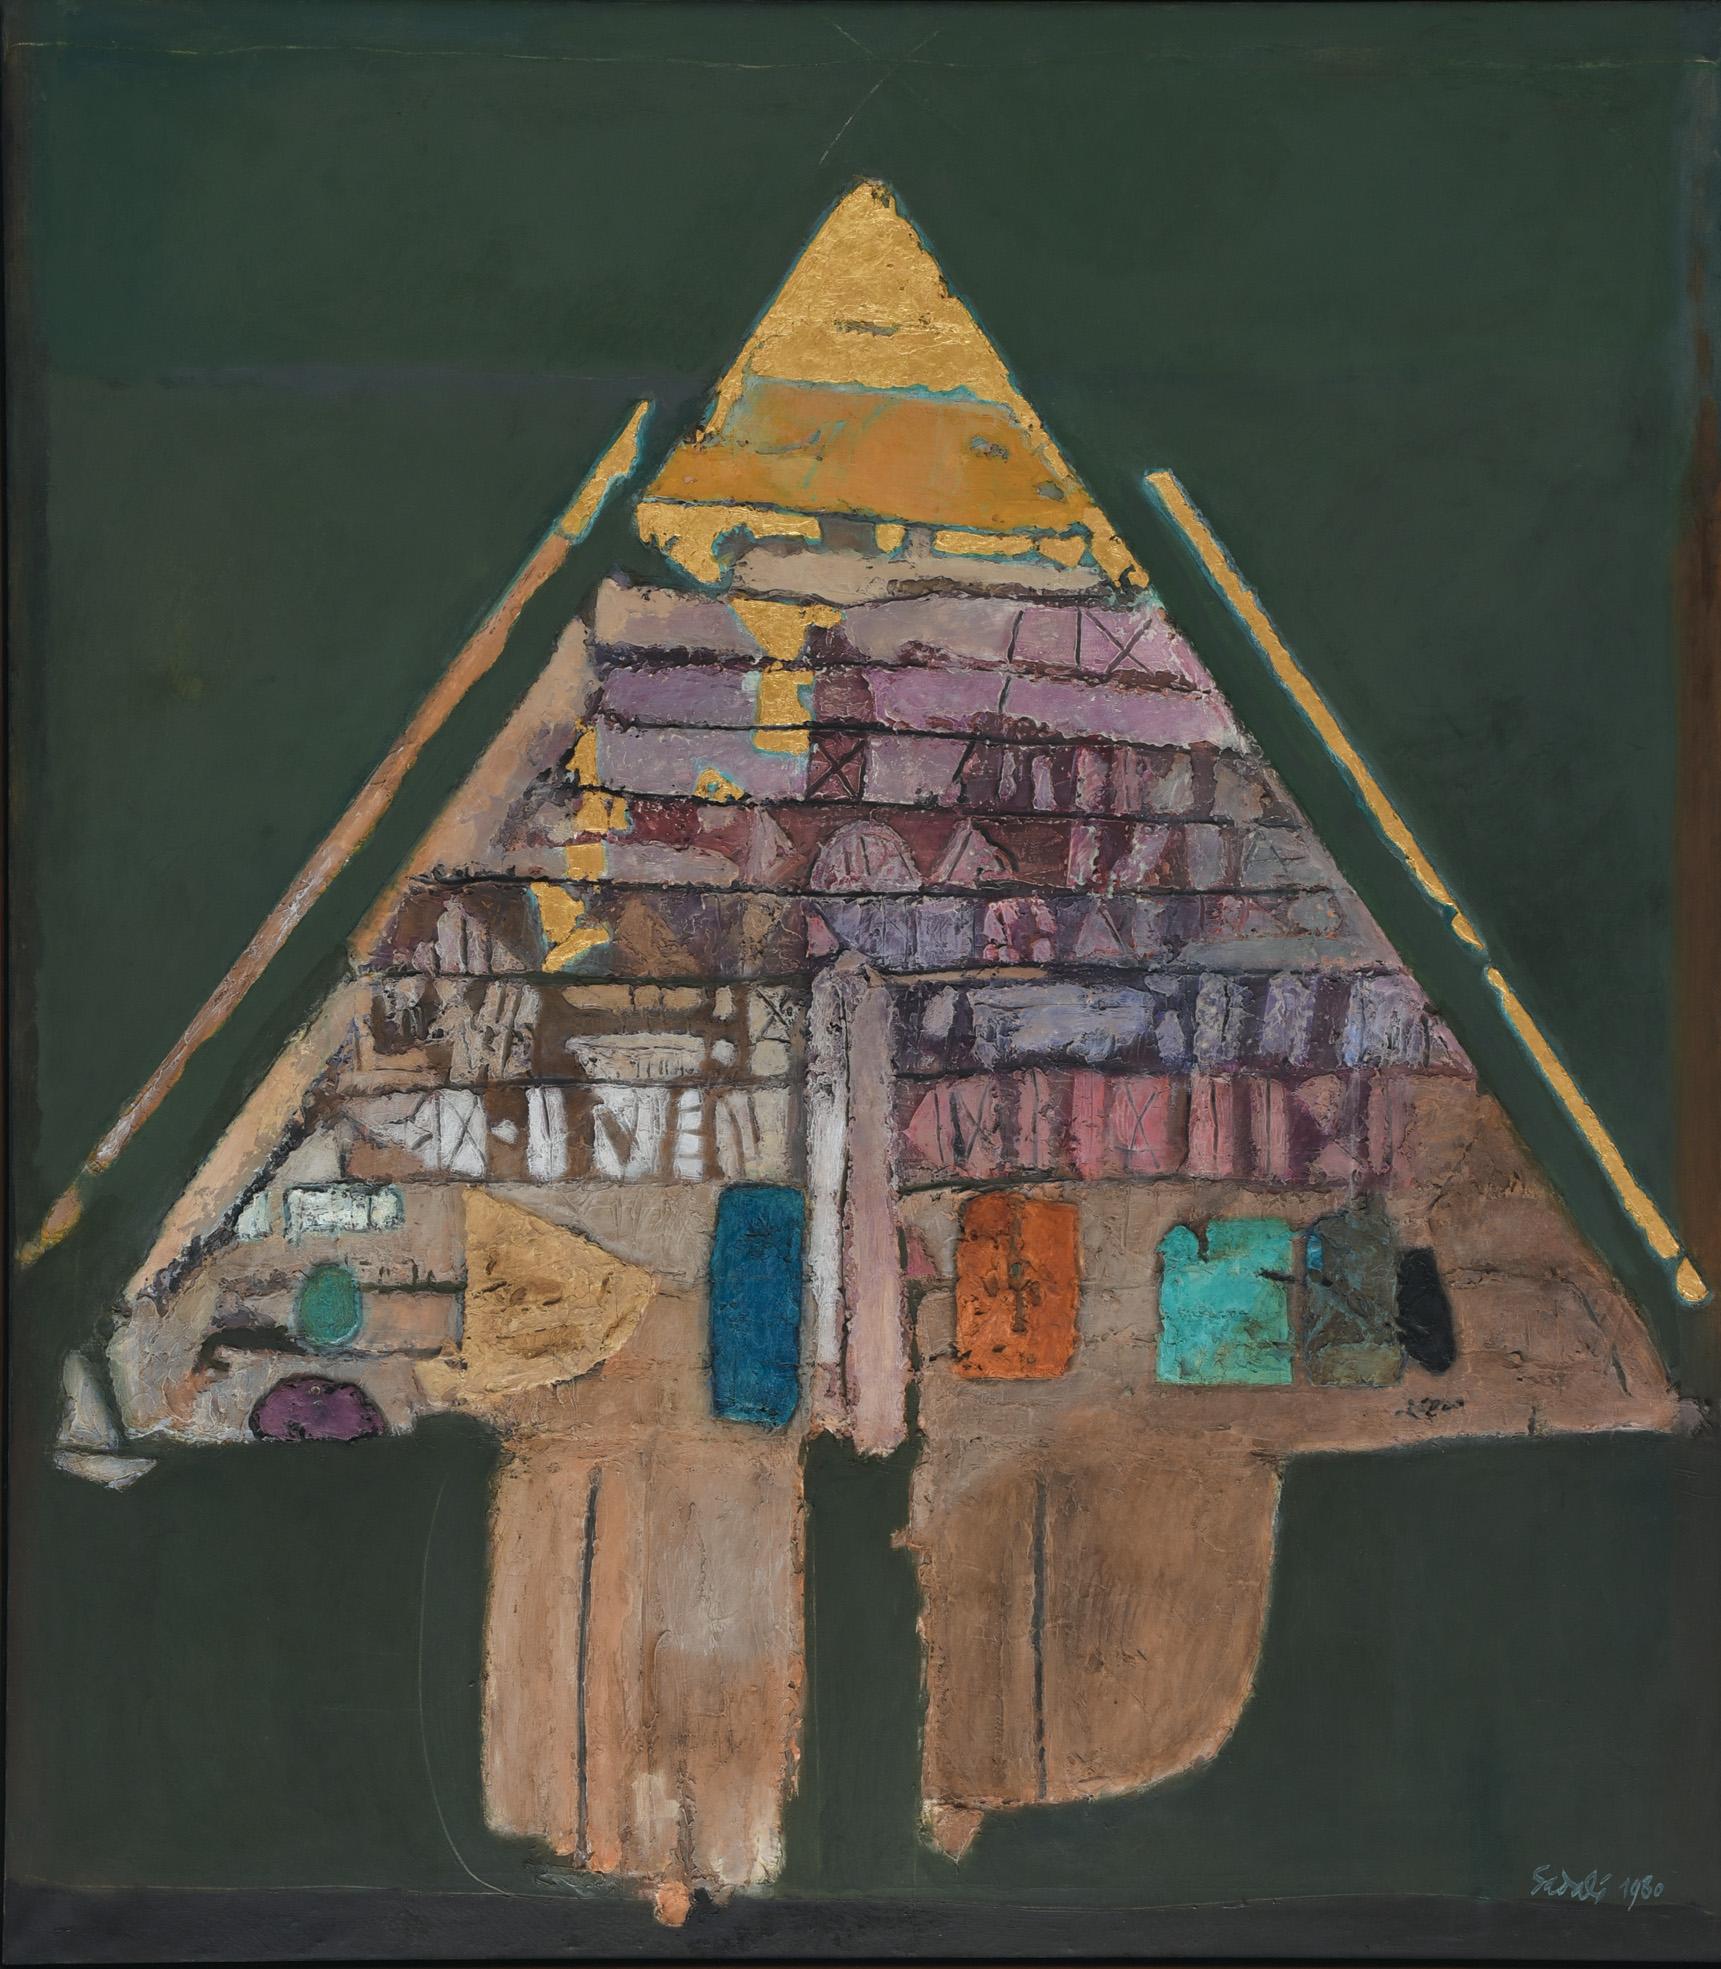 Ahmad Sadali, Gunungan, 1980, 200 x 175 cm